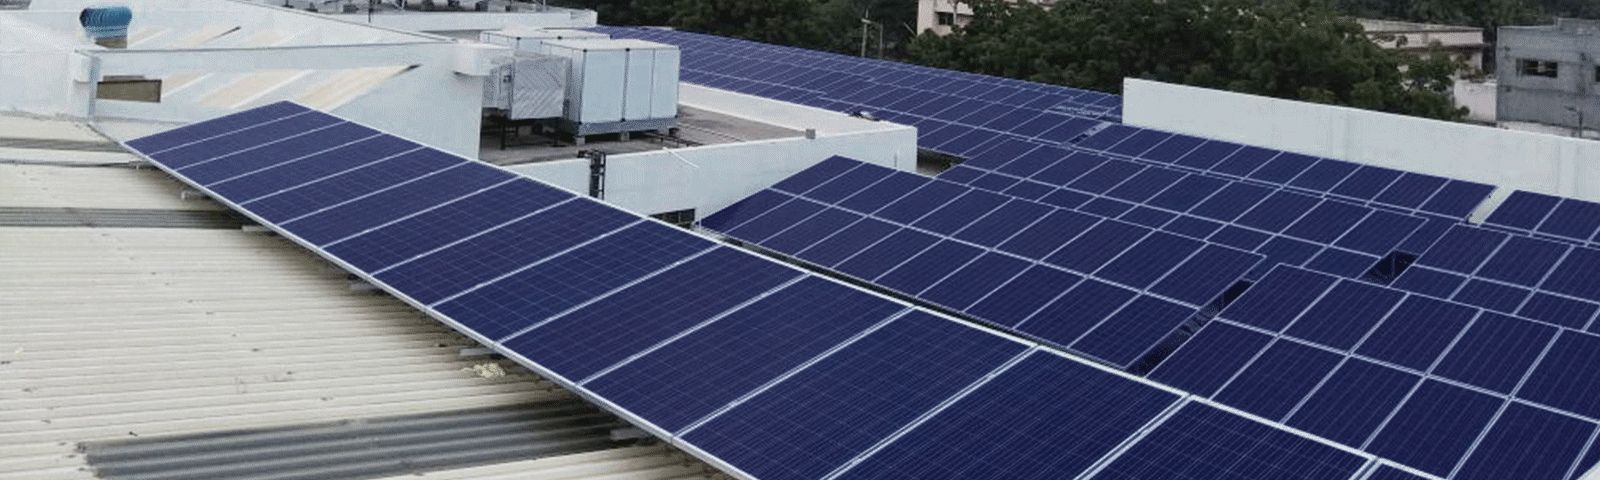 Rooftop_pic_Big_banner Solar panel cost, Solar panels